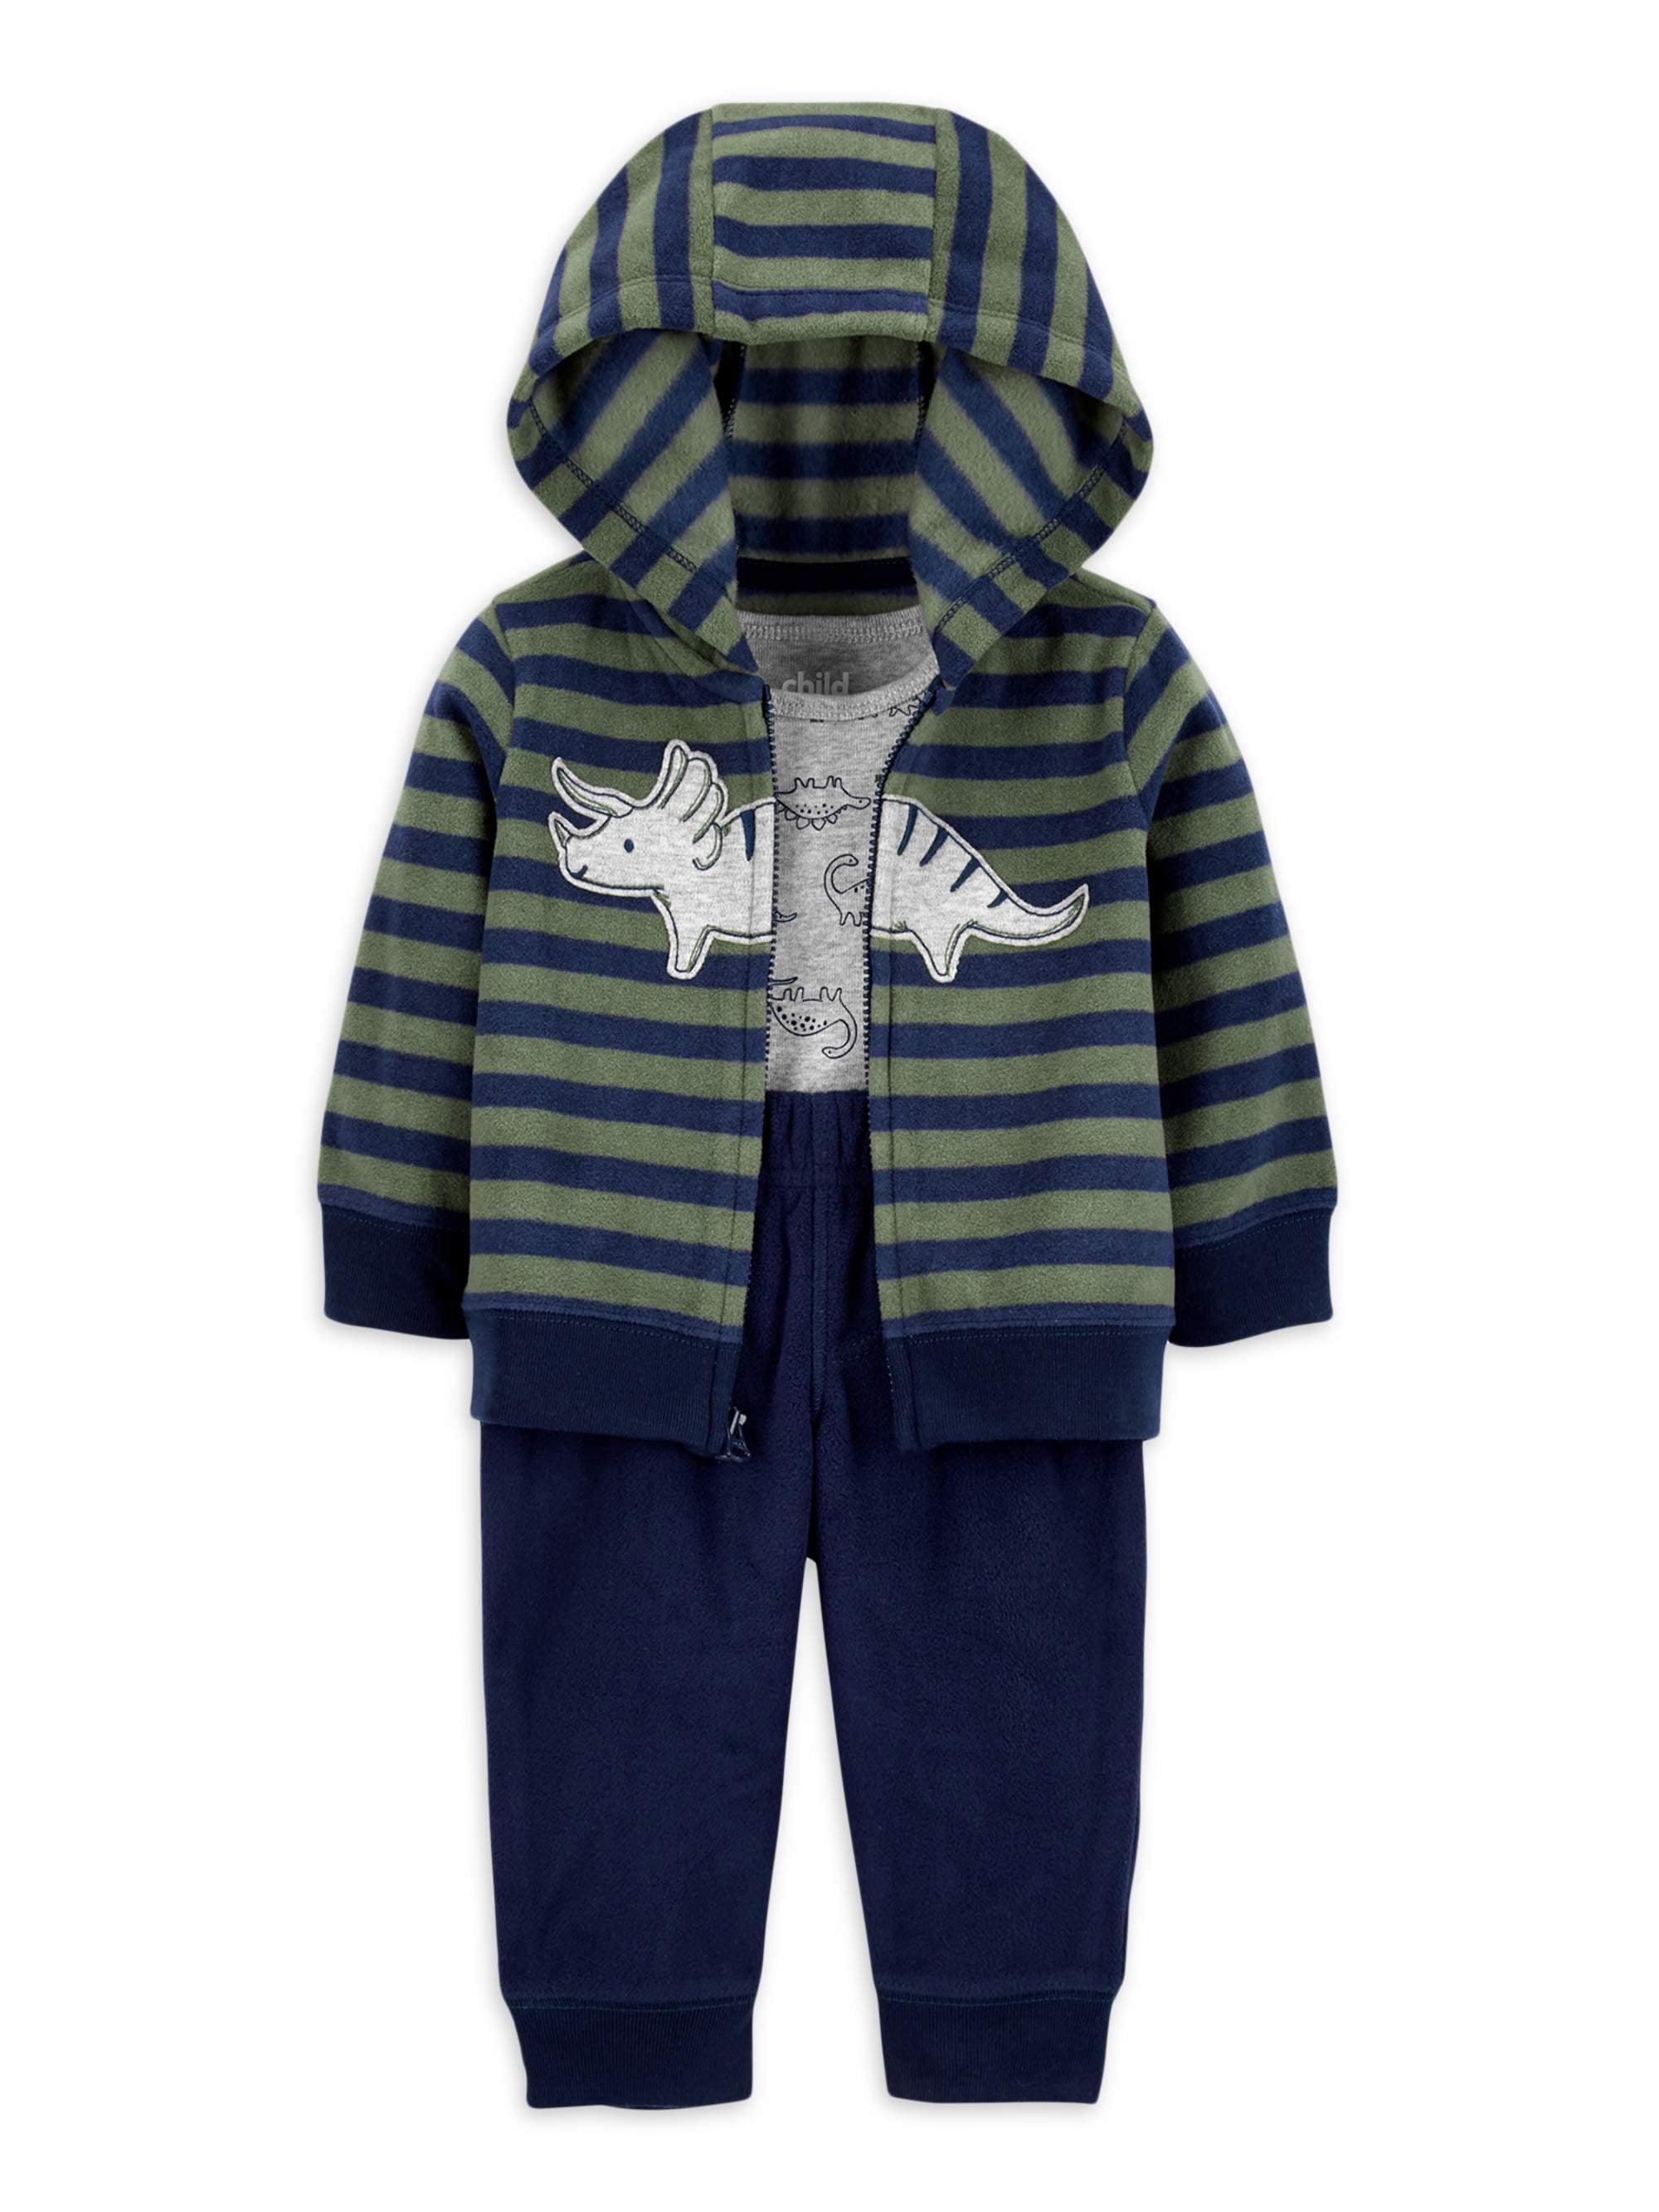 Pants and Sweater Fleece Hooded Jumpsuit Simple Joys by Carters Baby Boys 3-Piece Fleece Playwear Set